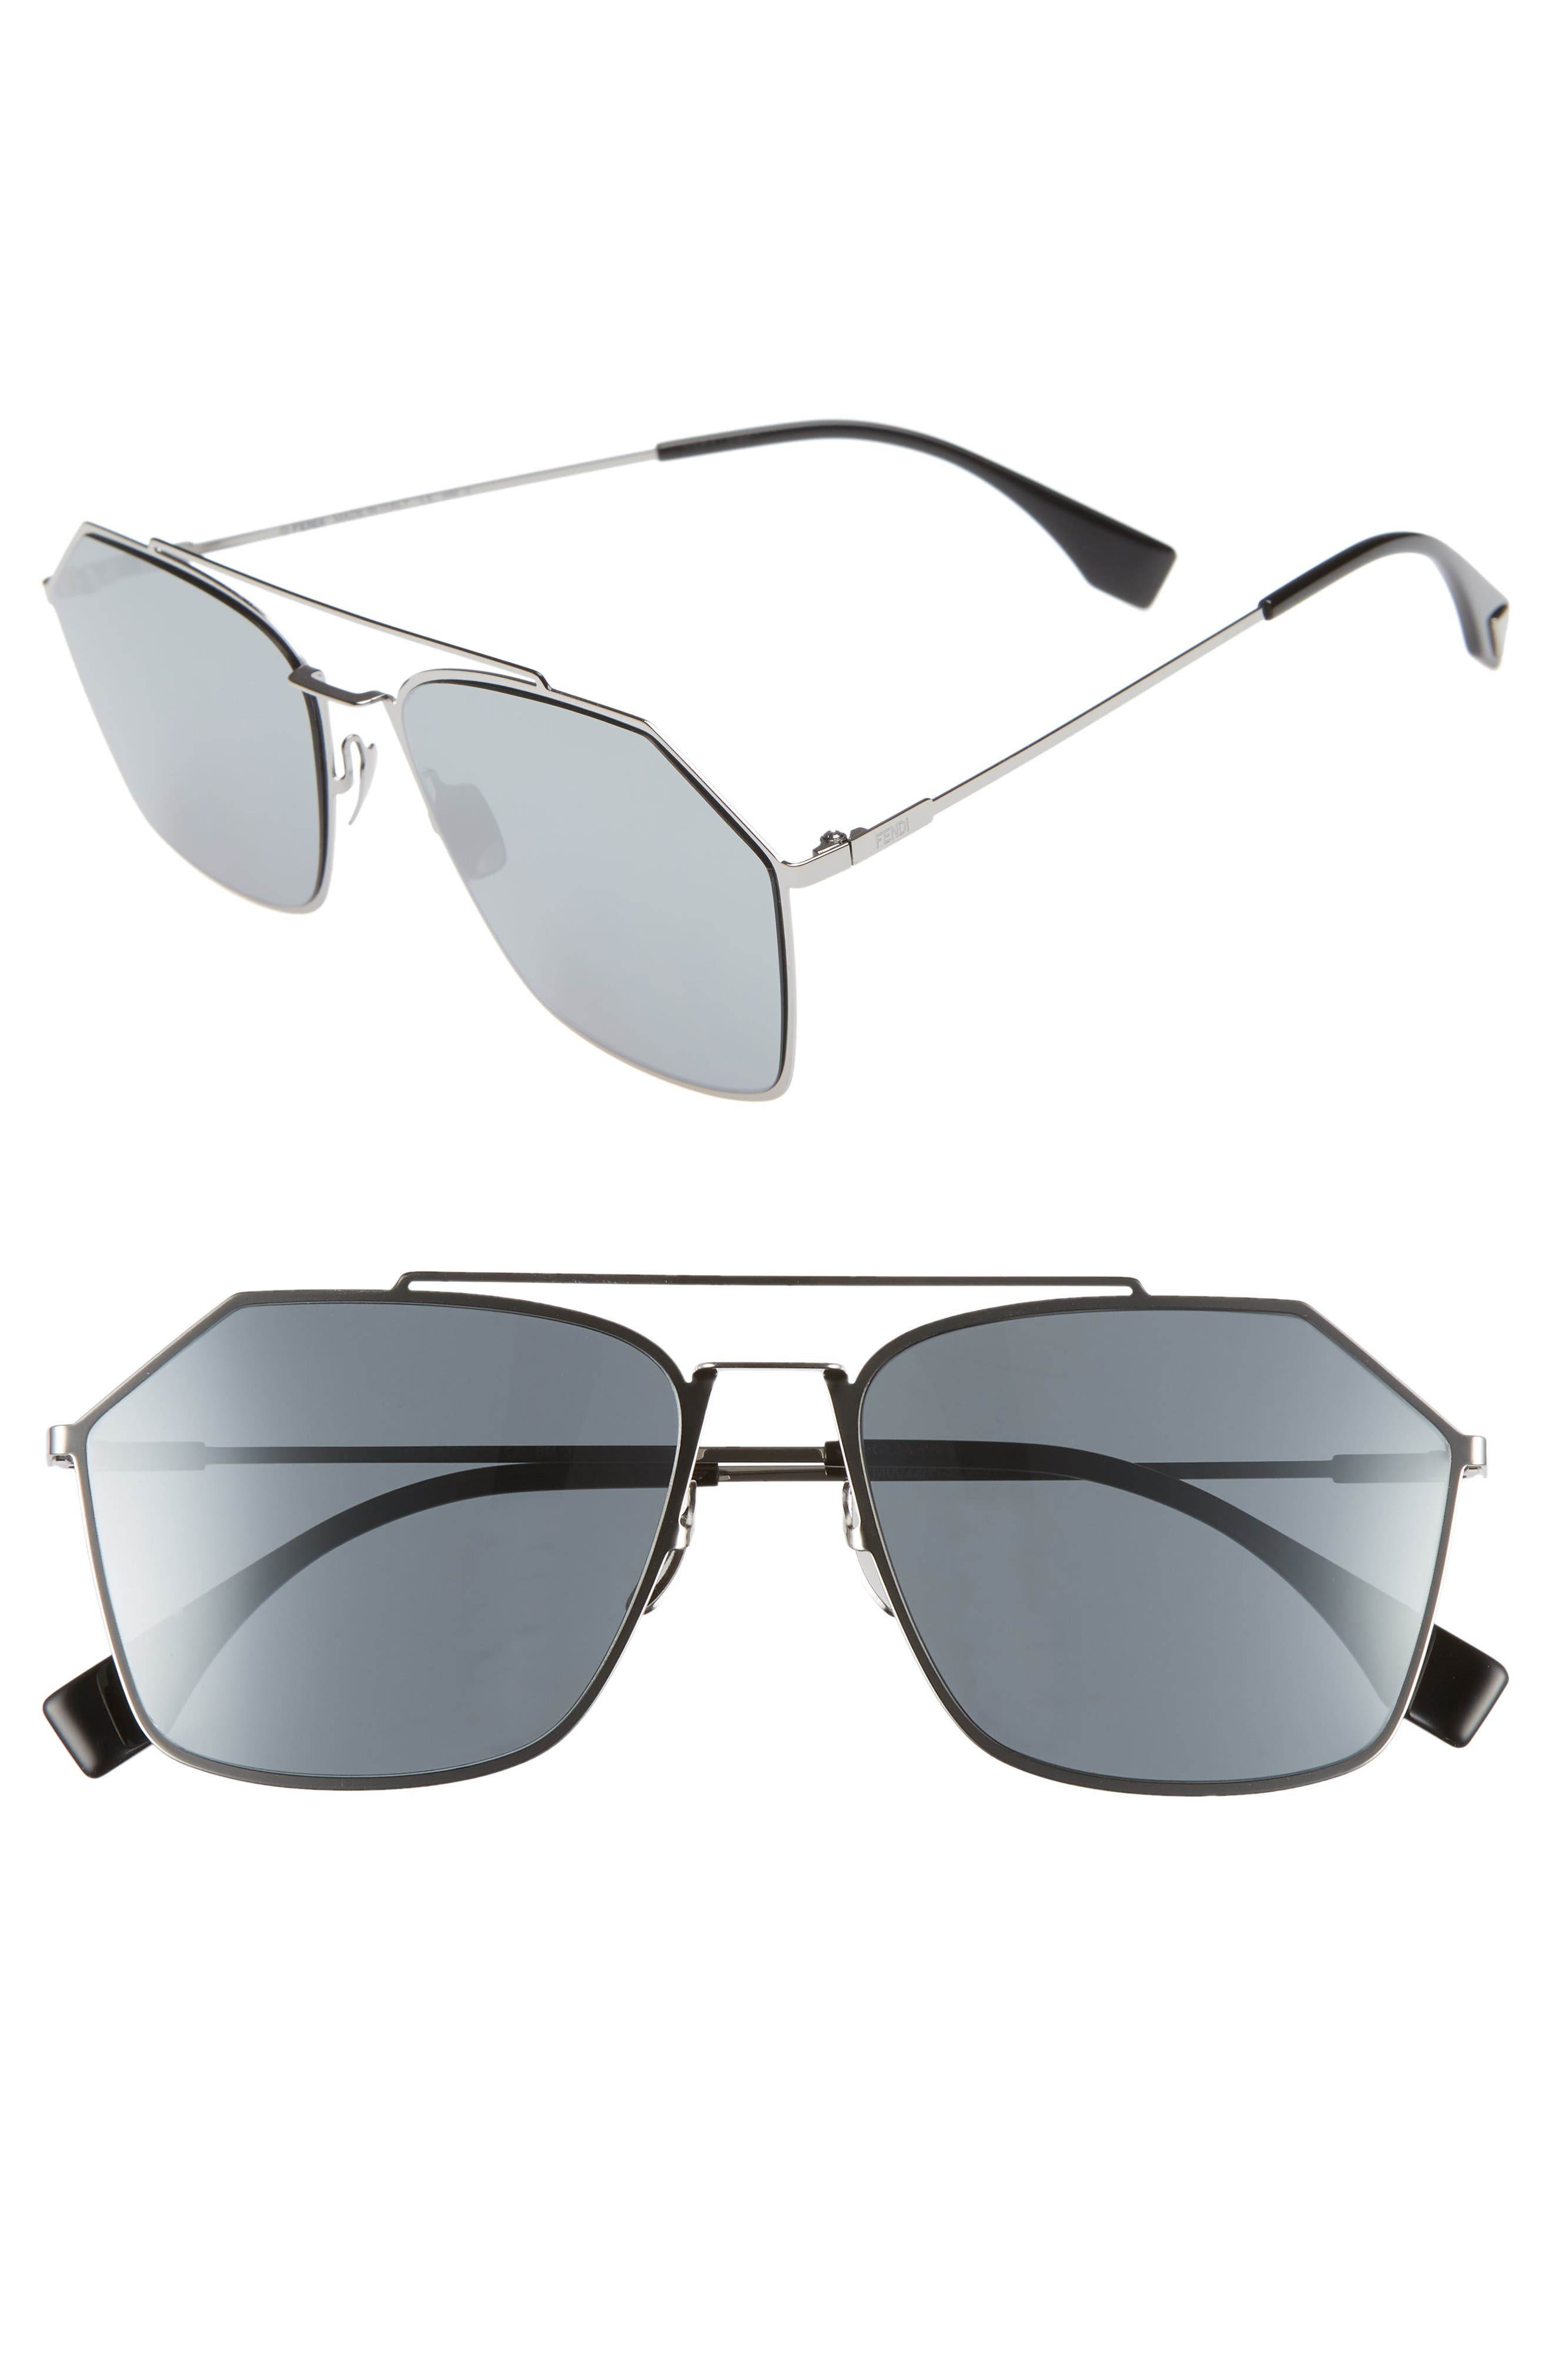 59mm Navigator Sunglasses,                             Main thumbnail 1, color,                             RUTHENIUM